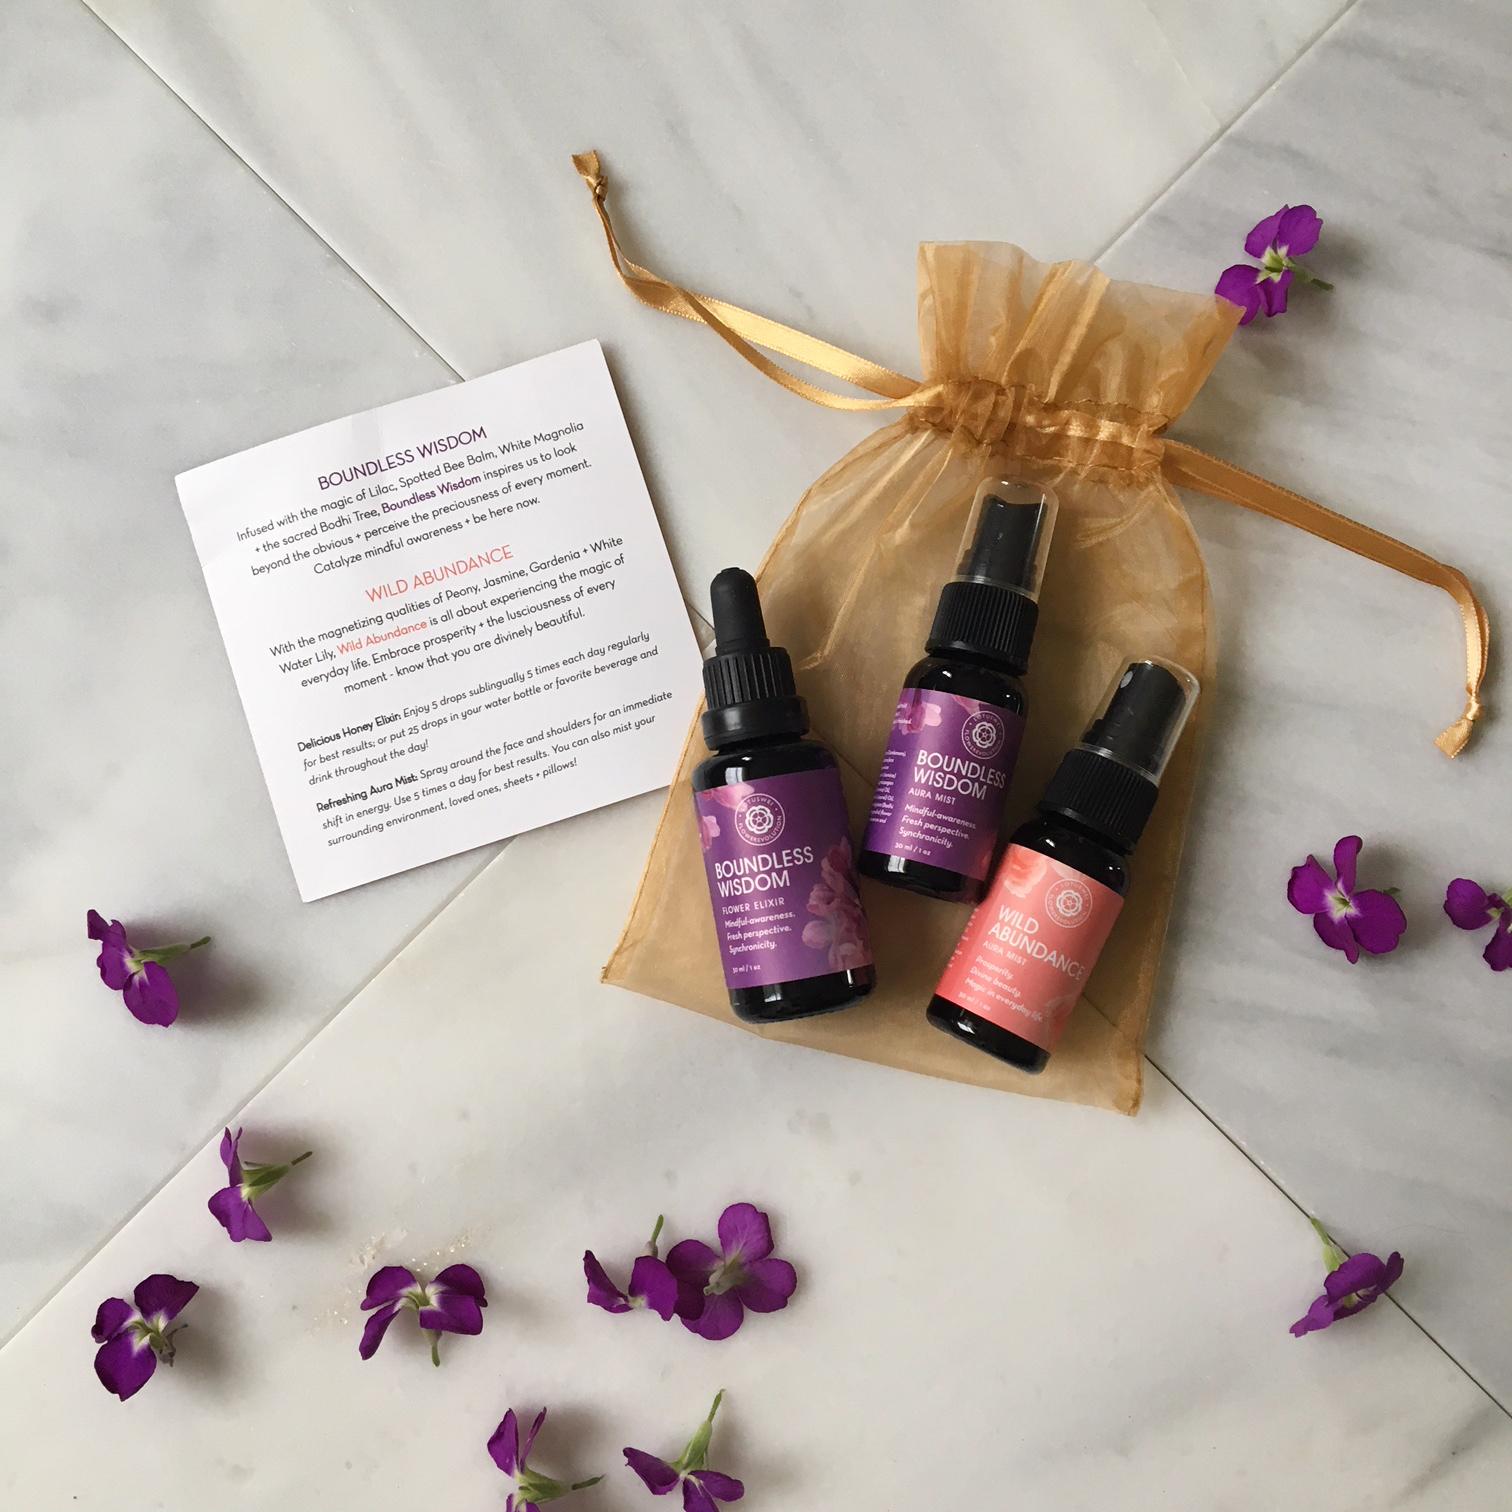 Lotus Wei Wild Abundance and Boundless Wisdom flower elixirs and aura mists